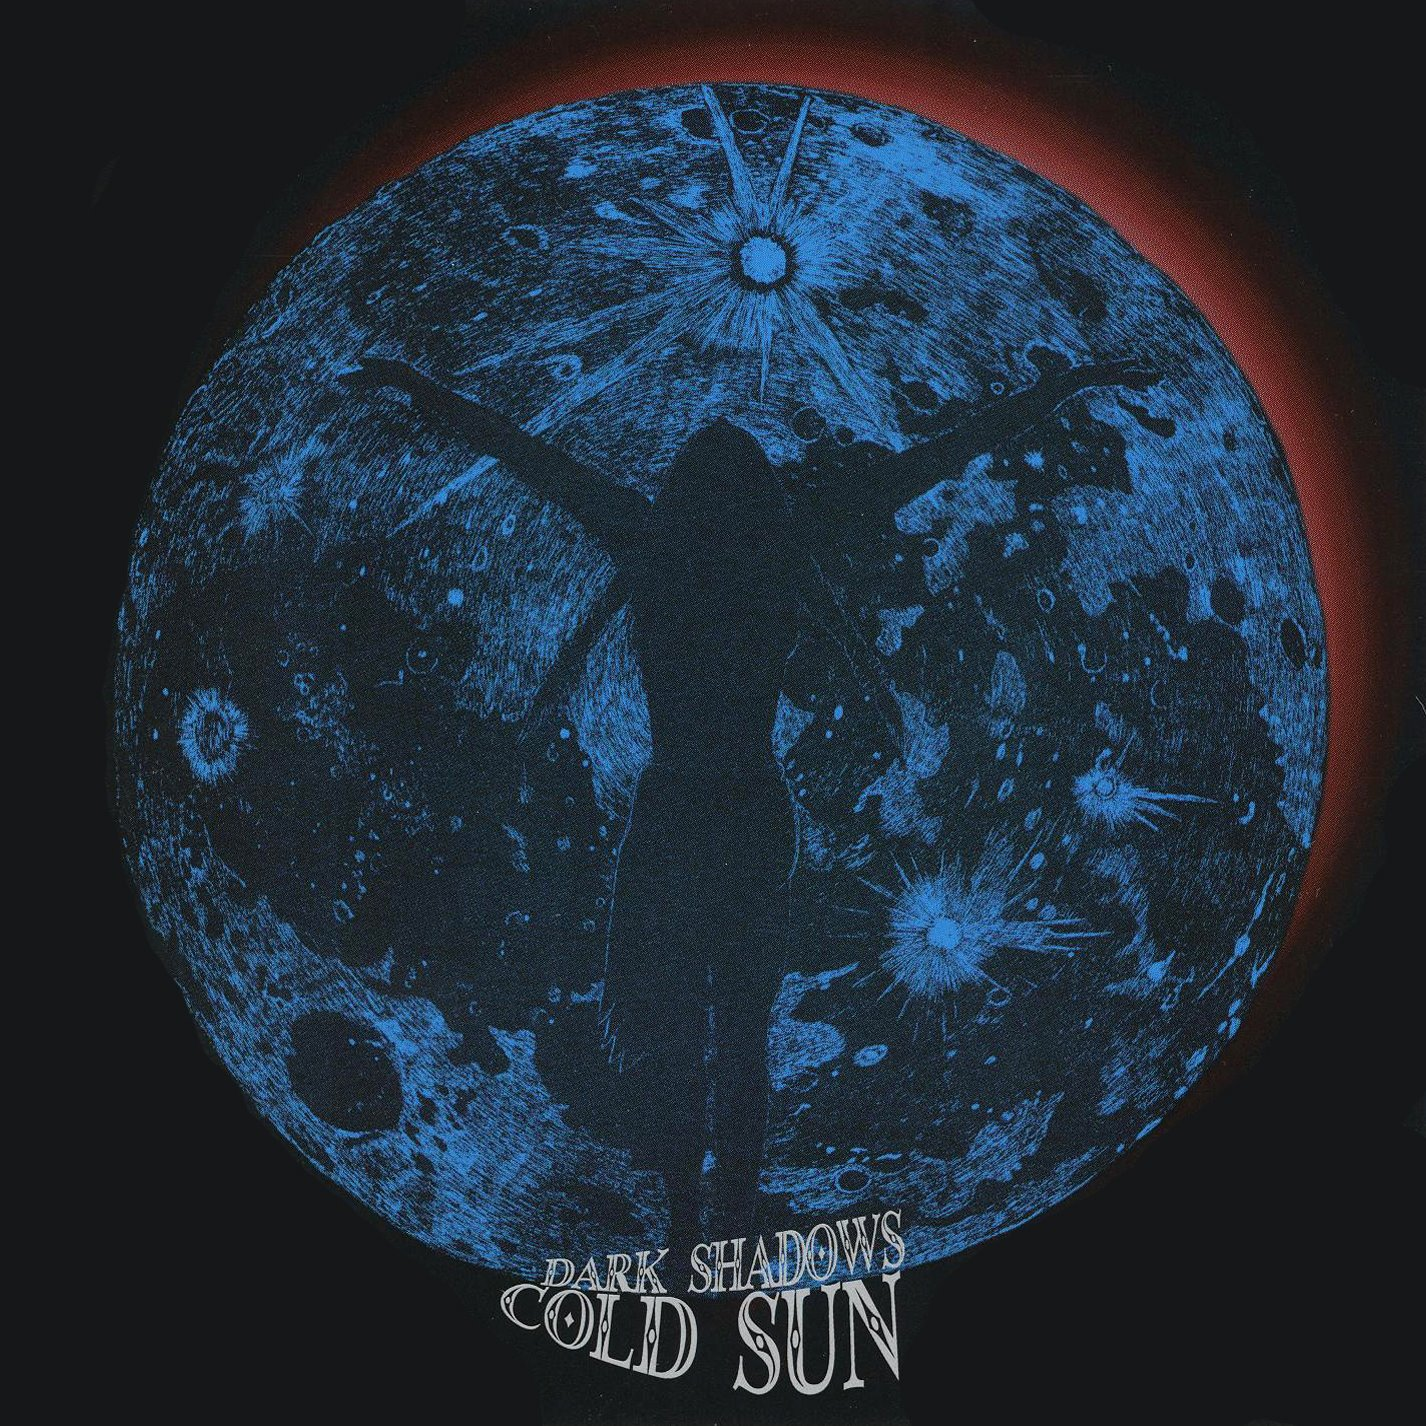 Cold Sun - 'Dark Shadows' (1970)